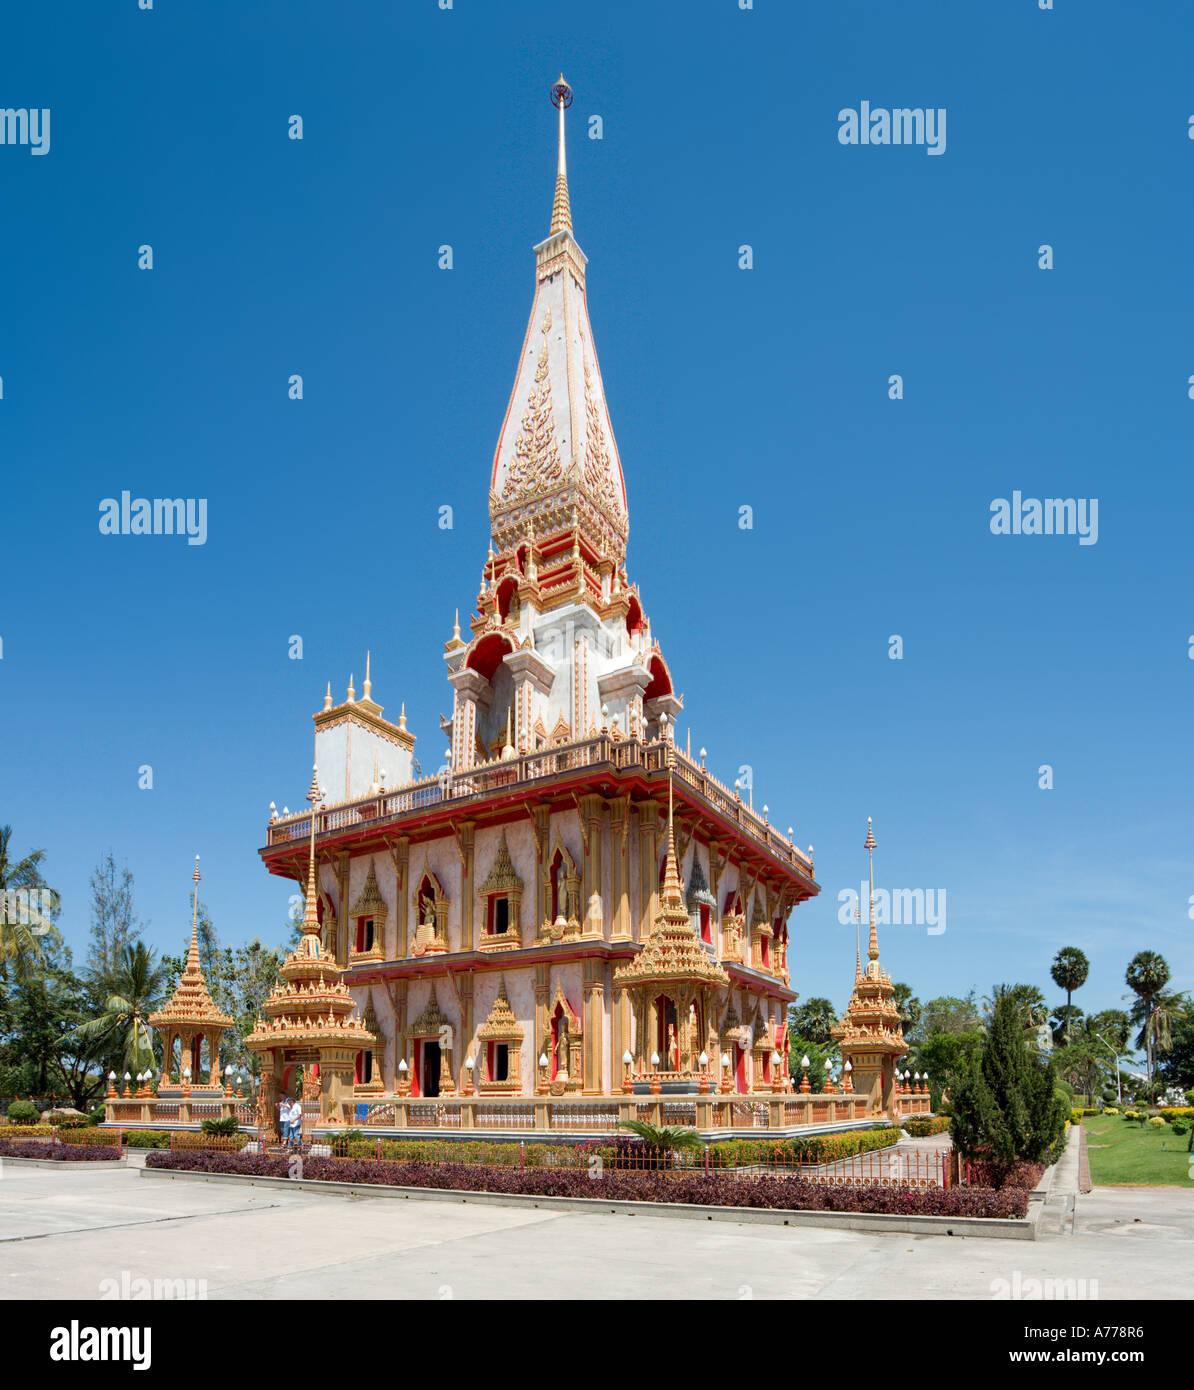 Wat Chalong Buddhist Temple, Phuket, Thailand Stock Photo